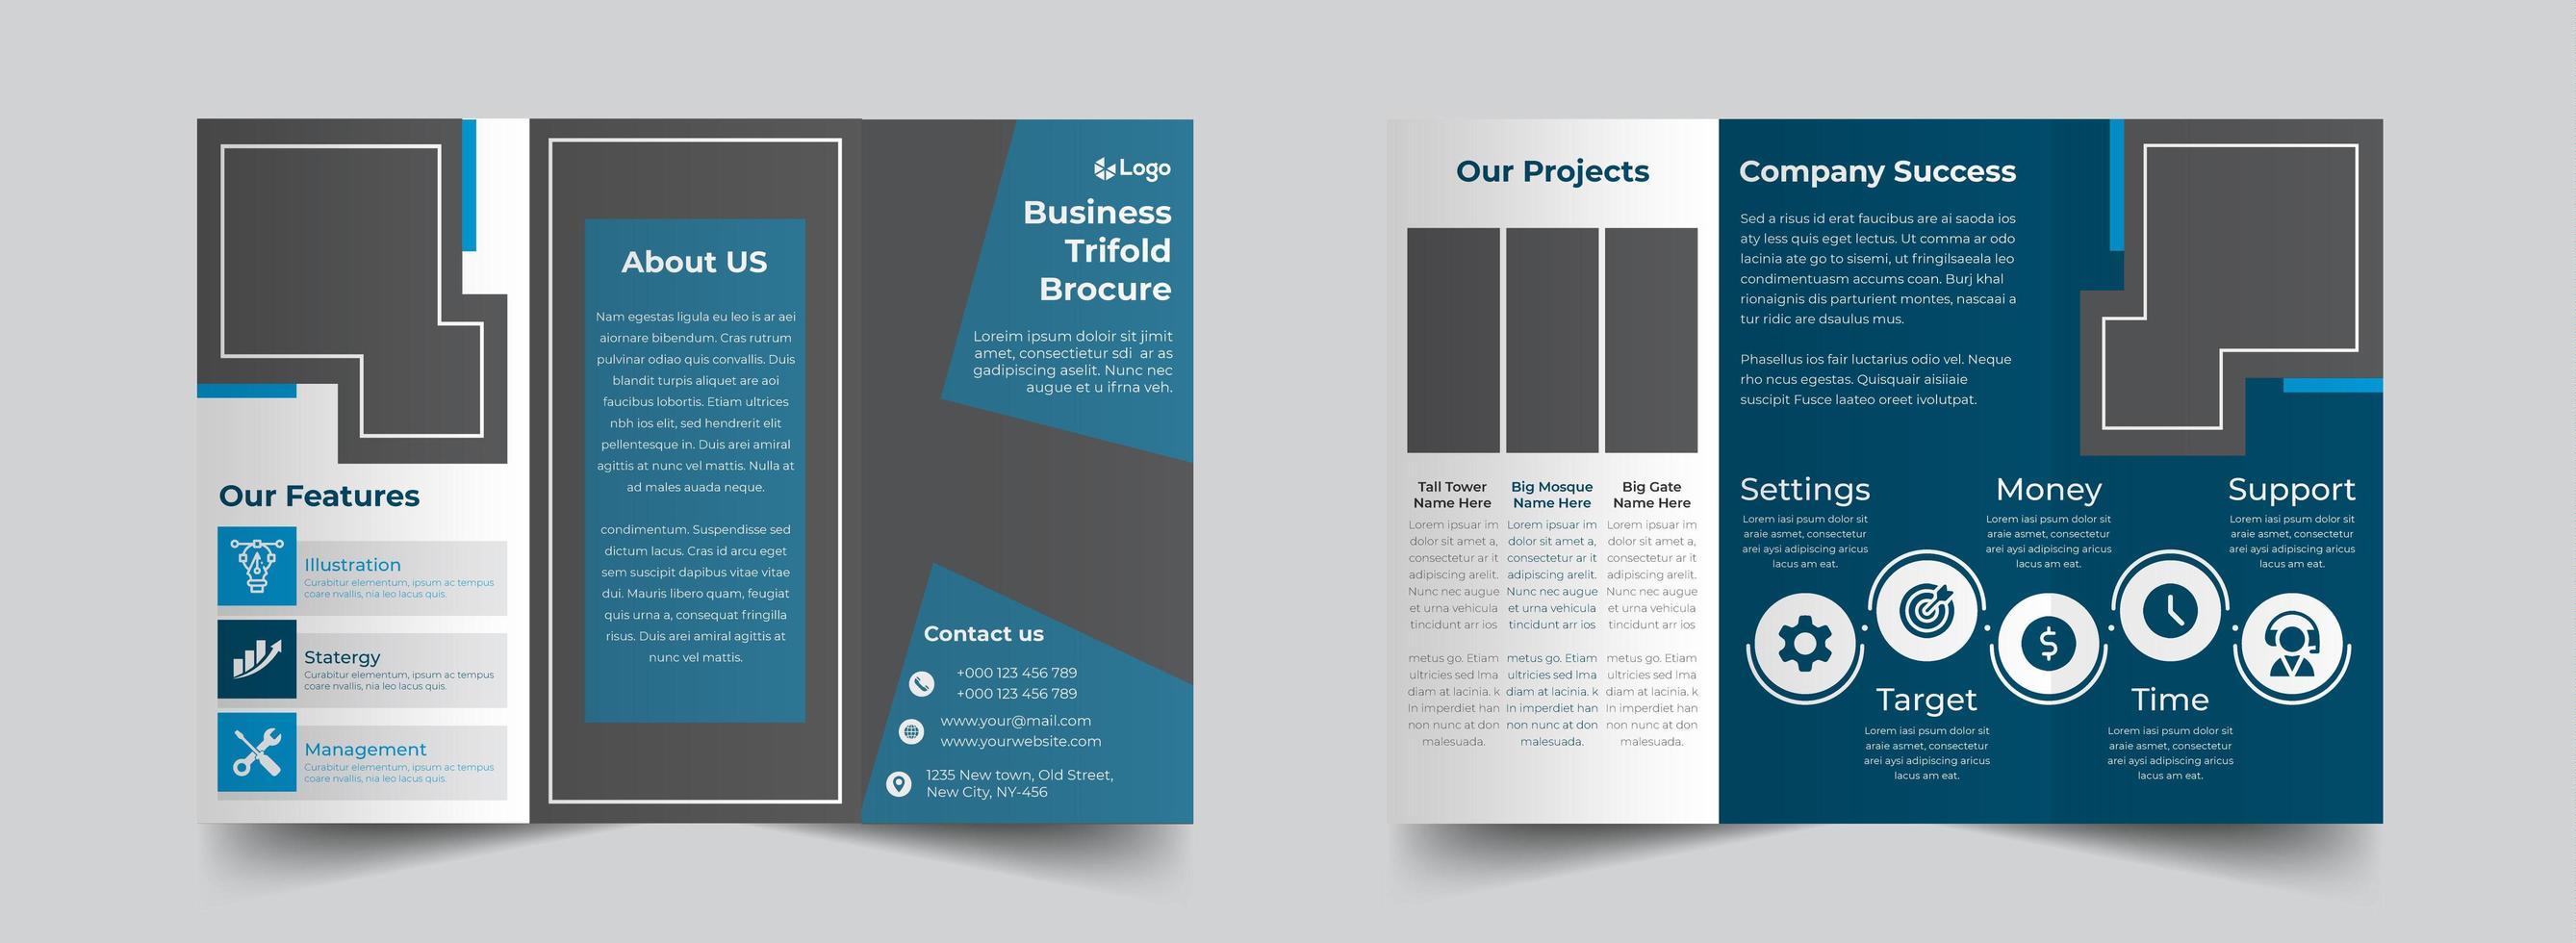 Blue Corporate Trifold Brochure Design Template vector